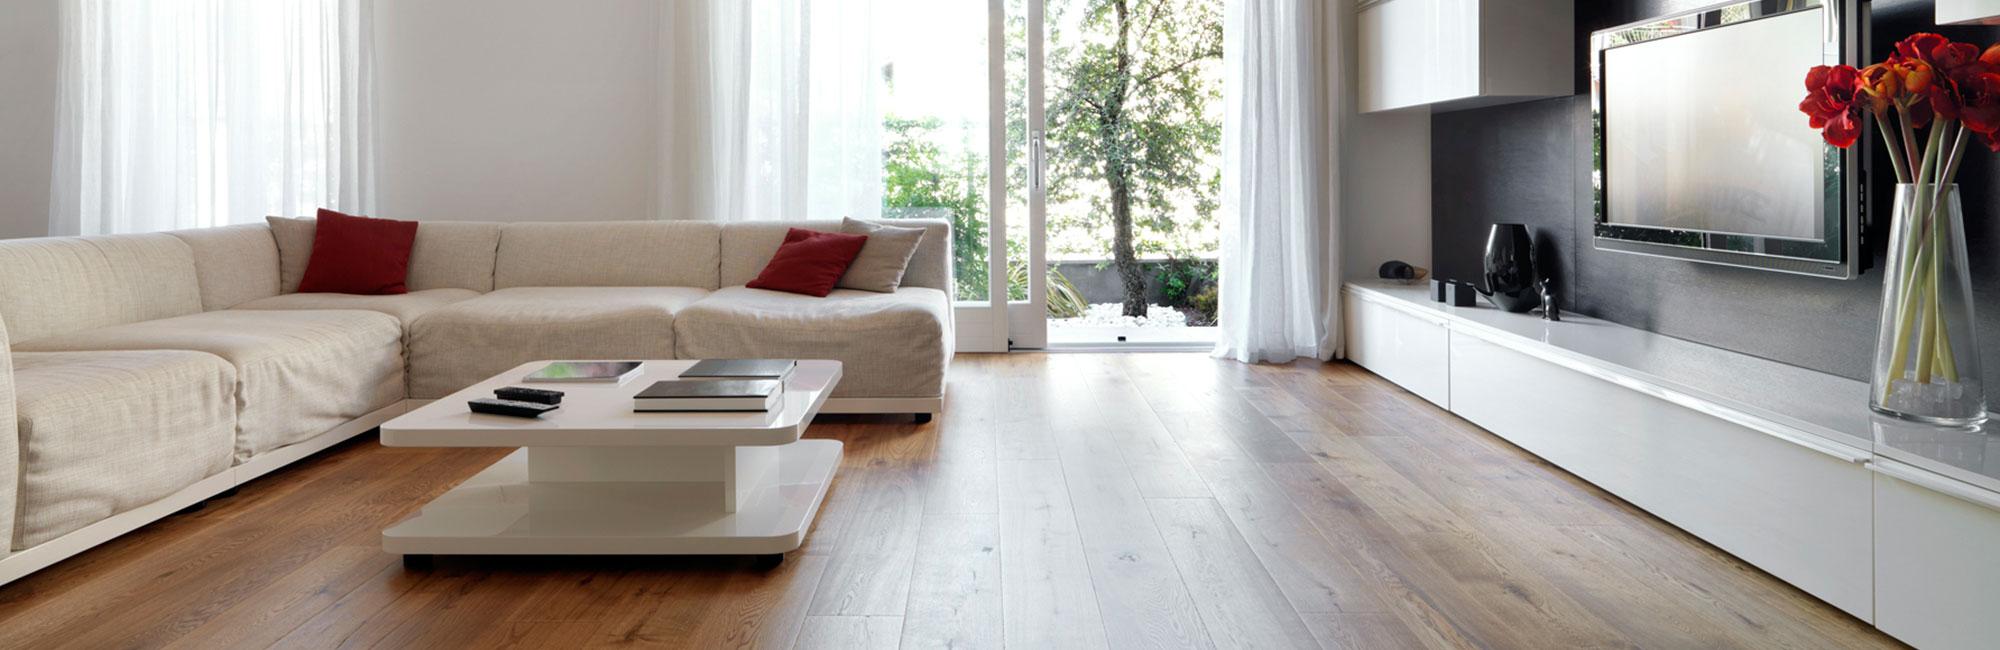 suelos-madera-ingenieria